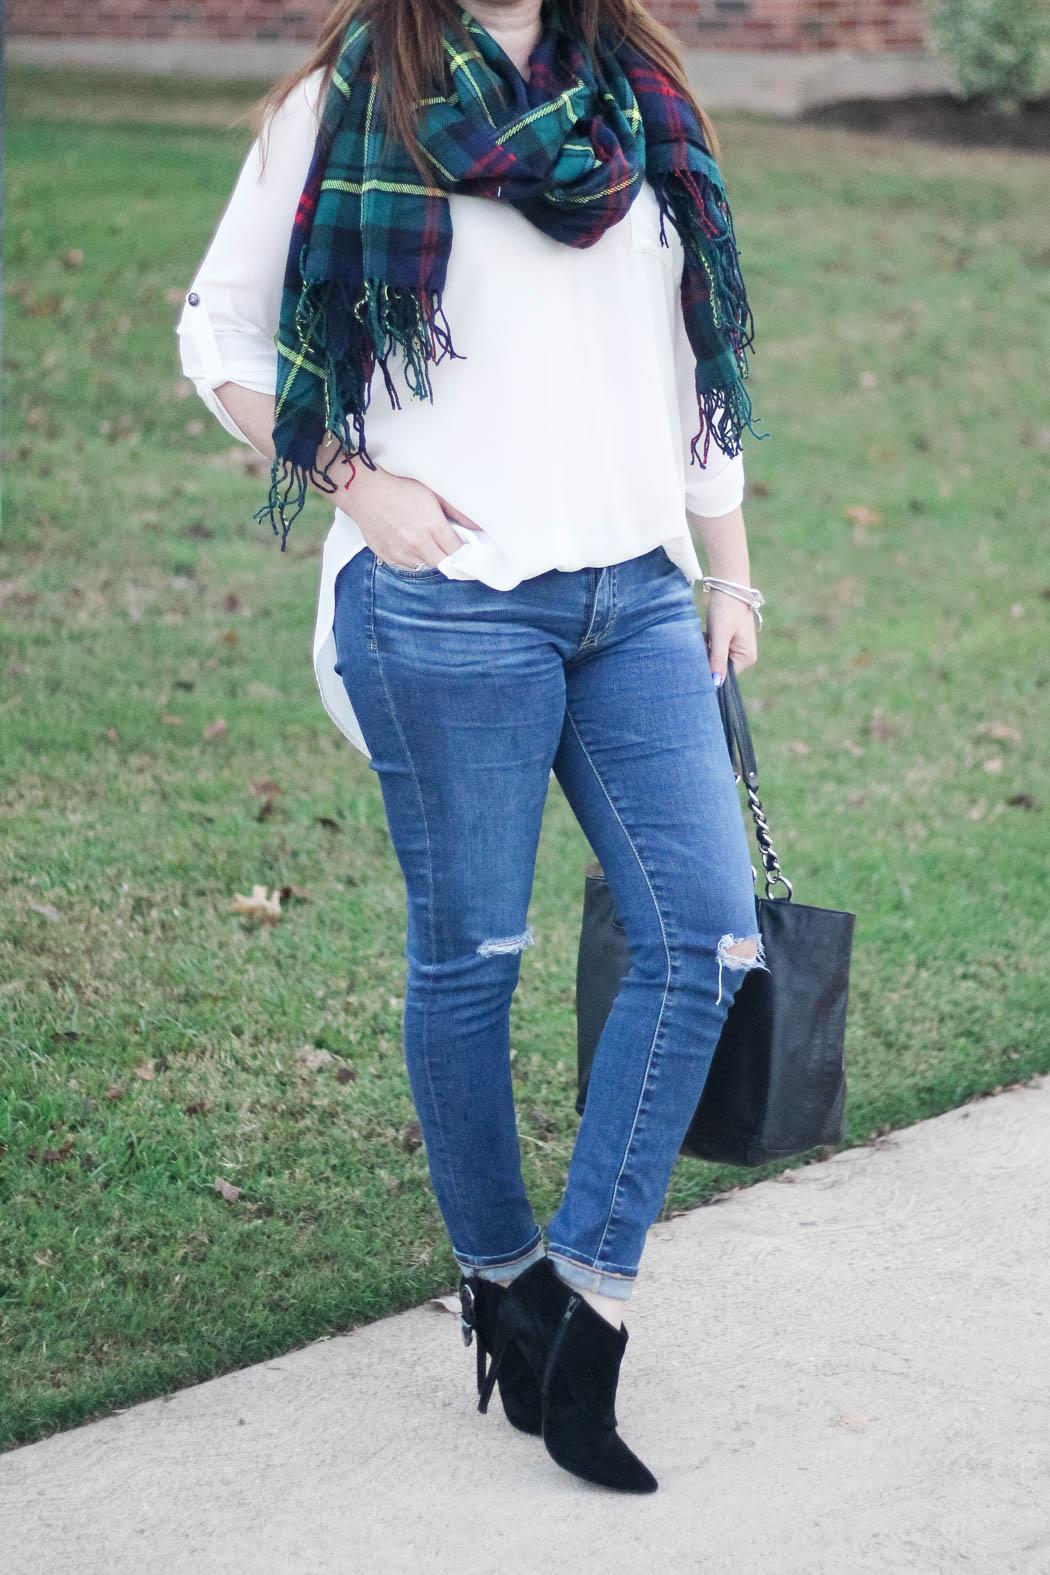 target-scarf-lush-tunic-ag-jeans-coach-bag-charles-david-booties-5